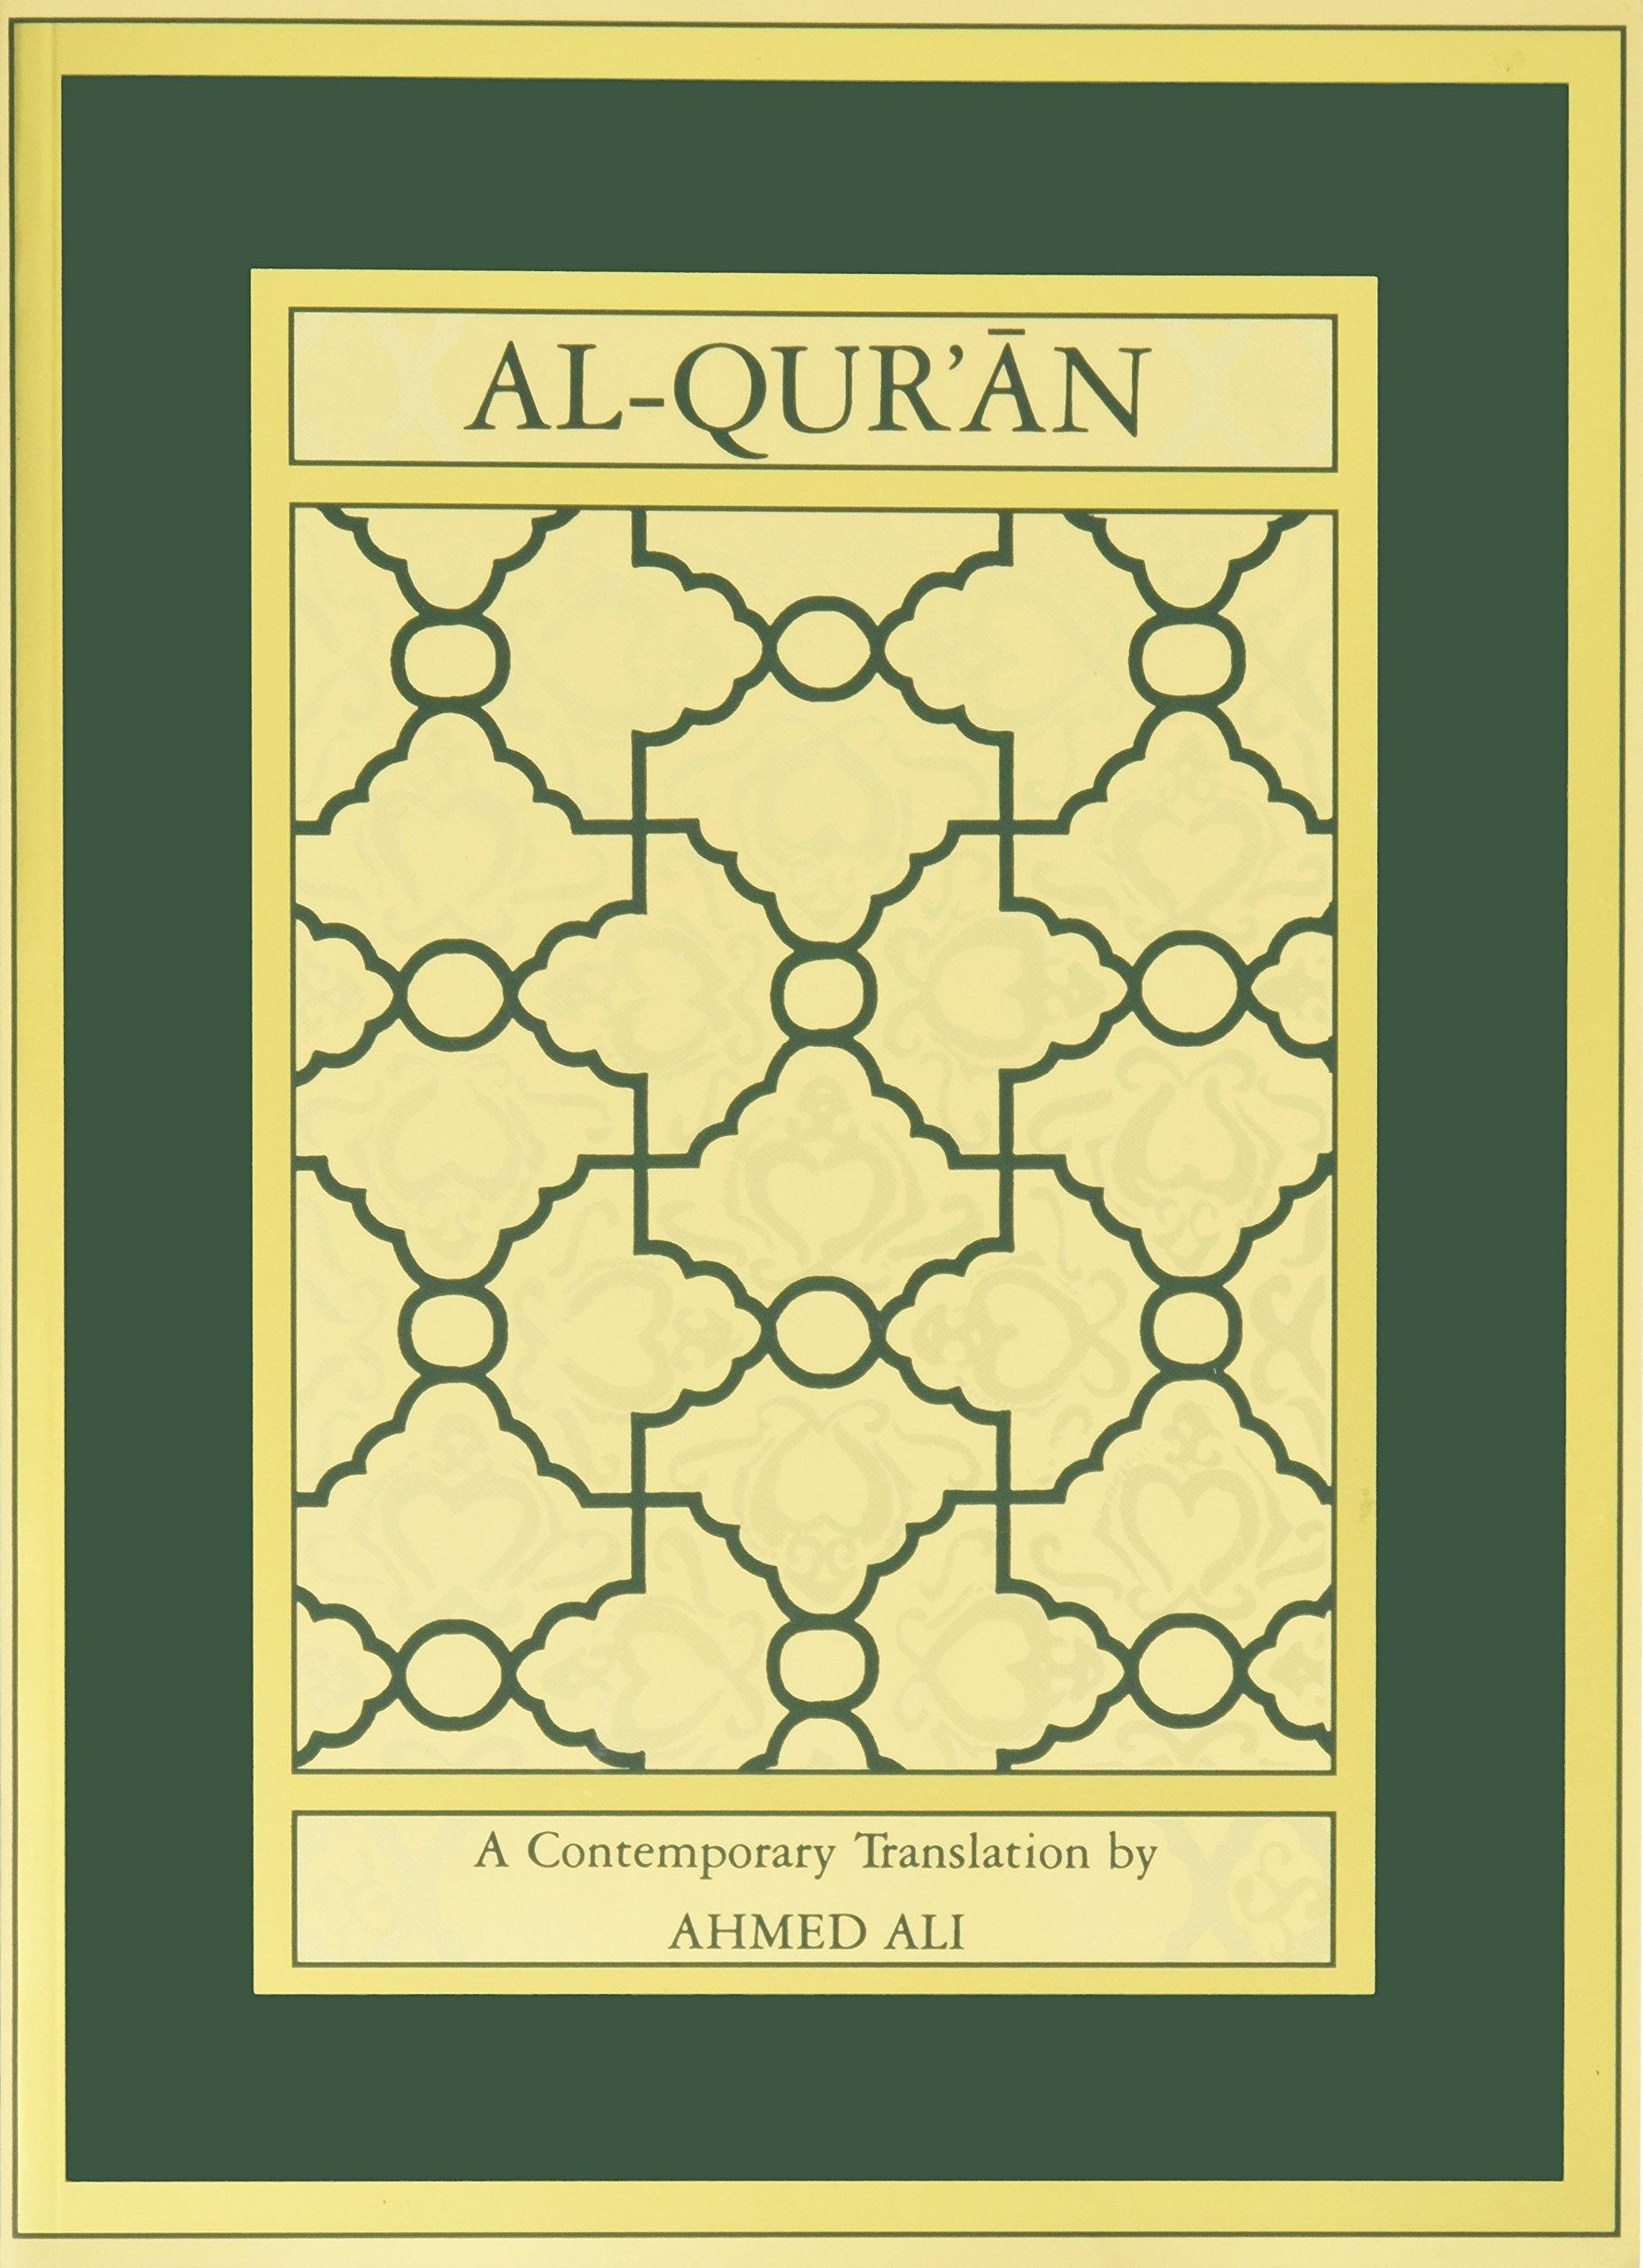 Al qur an a contemporary translation ahmed ali 9780691074993 amazon com books